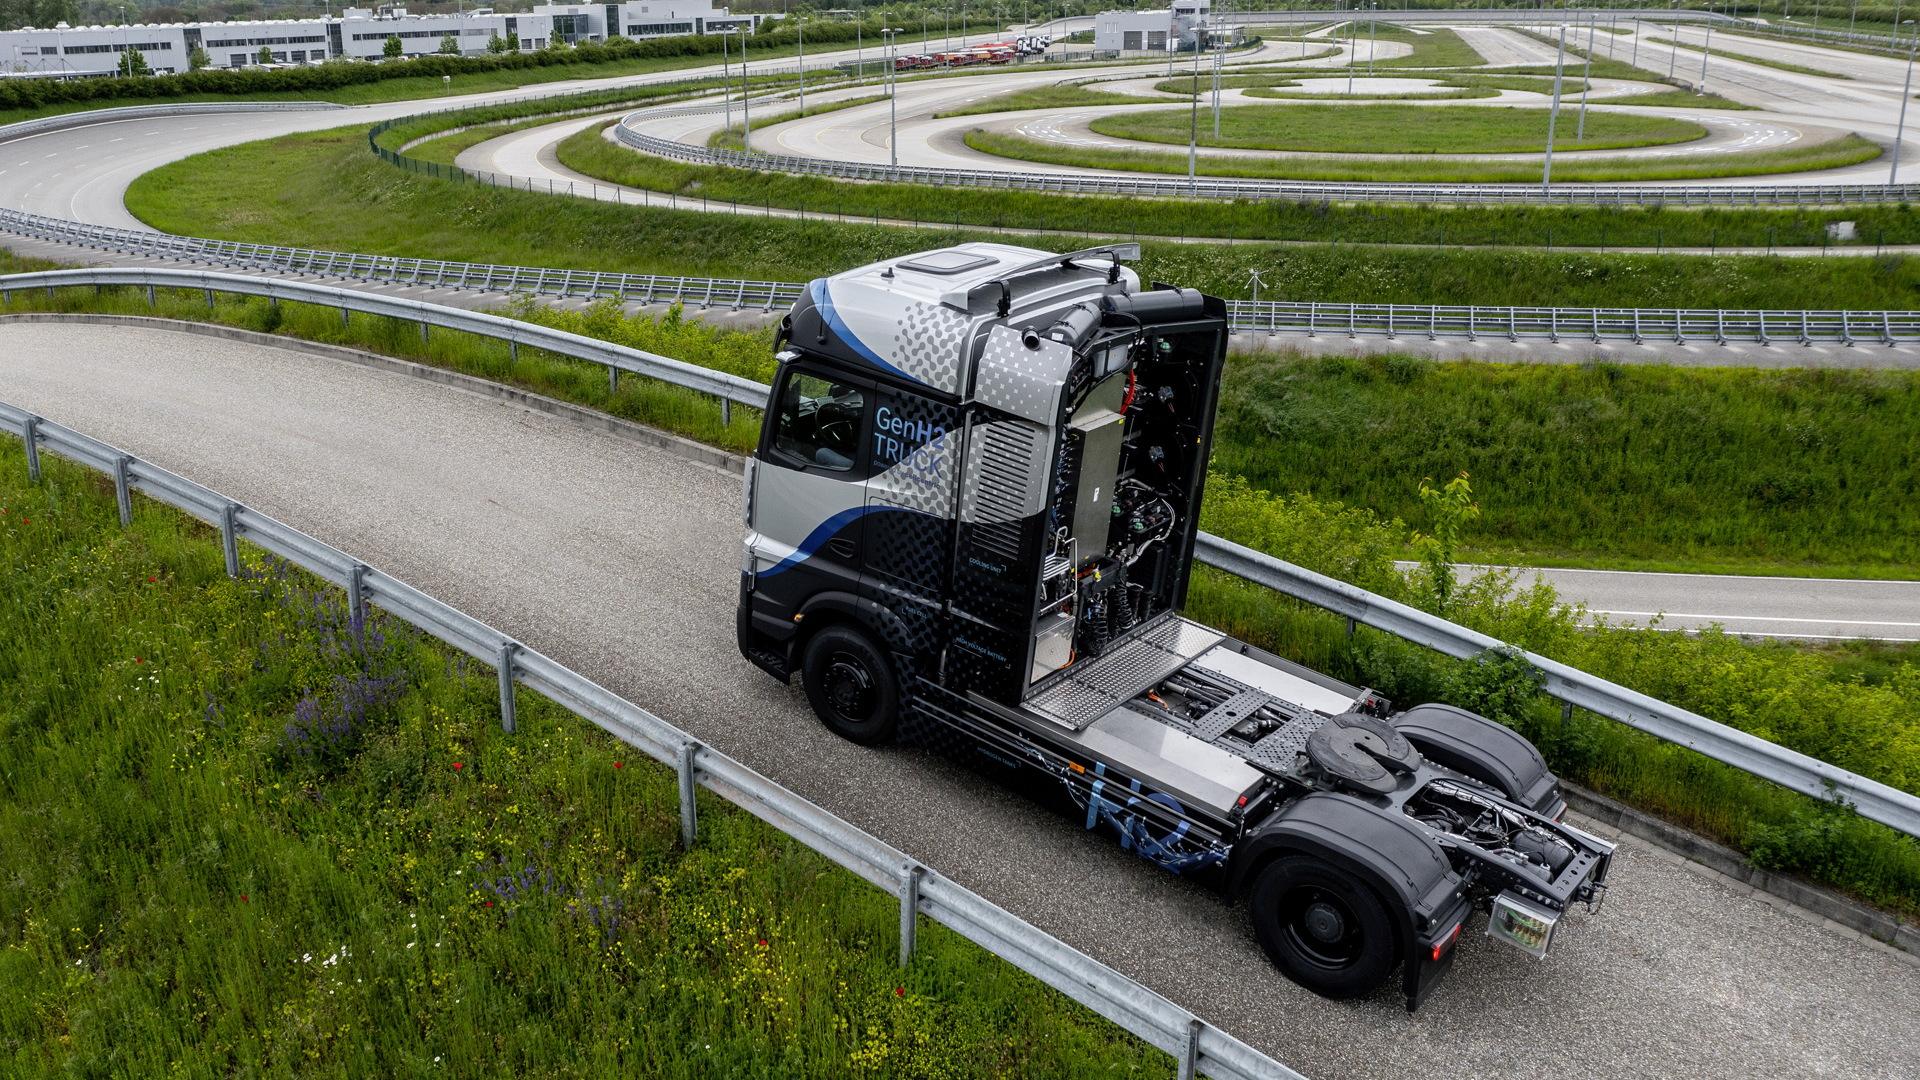 Mercedes-Benz Actros hydrogen-electric semi prototype